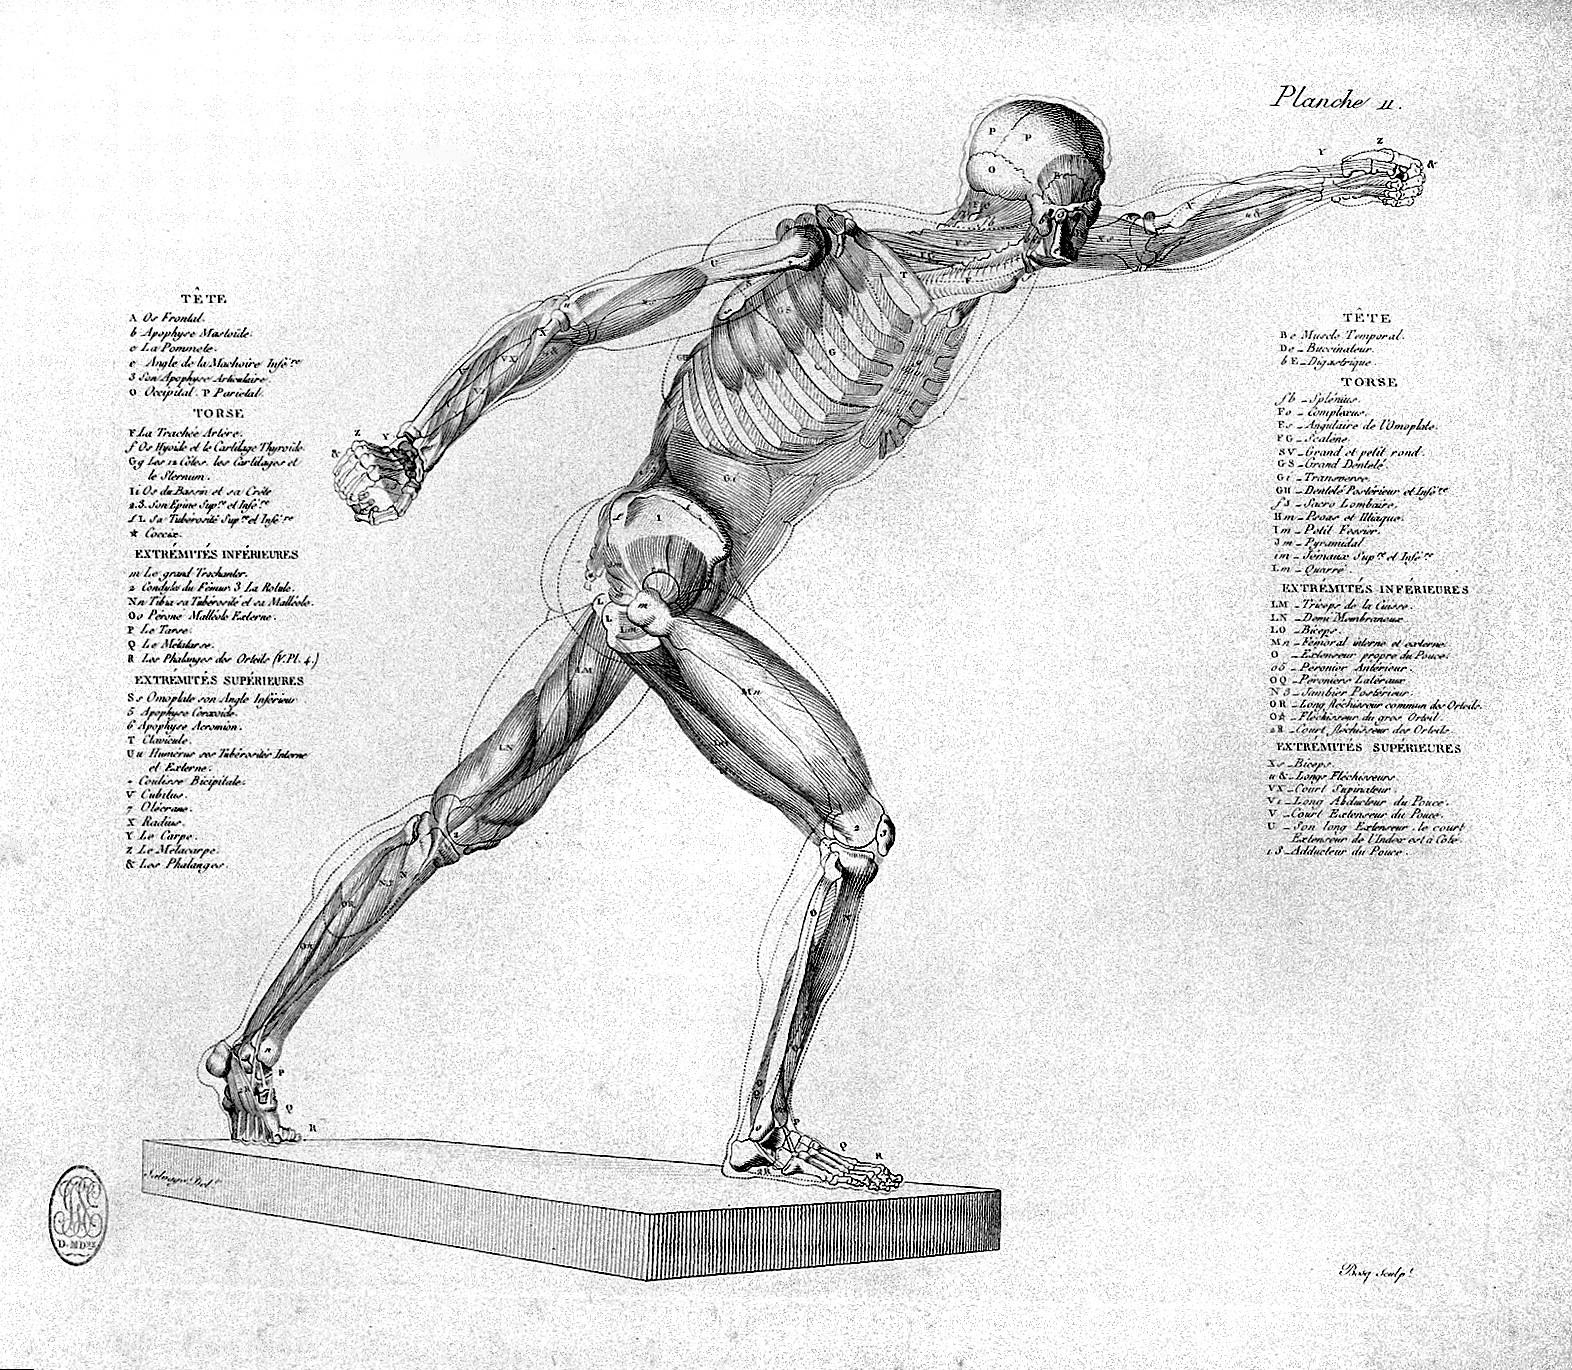 File:Jean-Galbert Salvage, Anatomie du Gladiateur Wellcome L0030265 ...